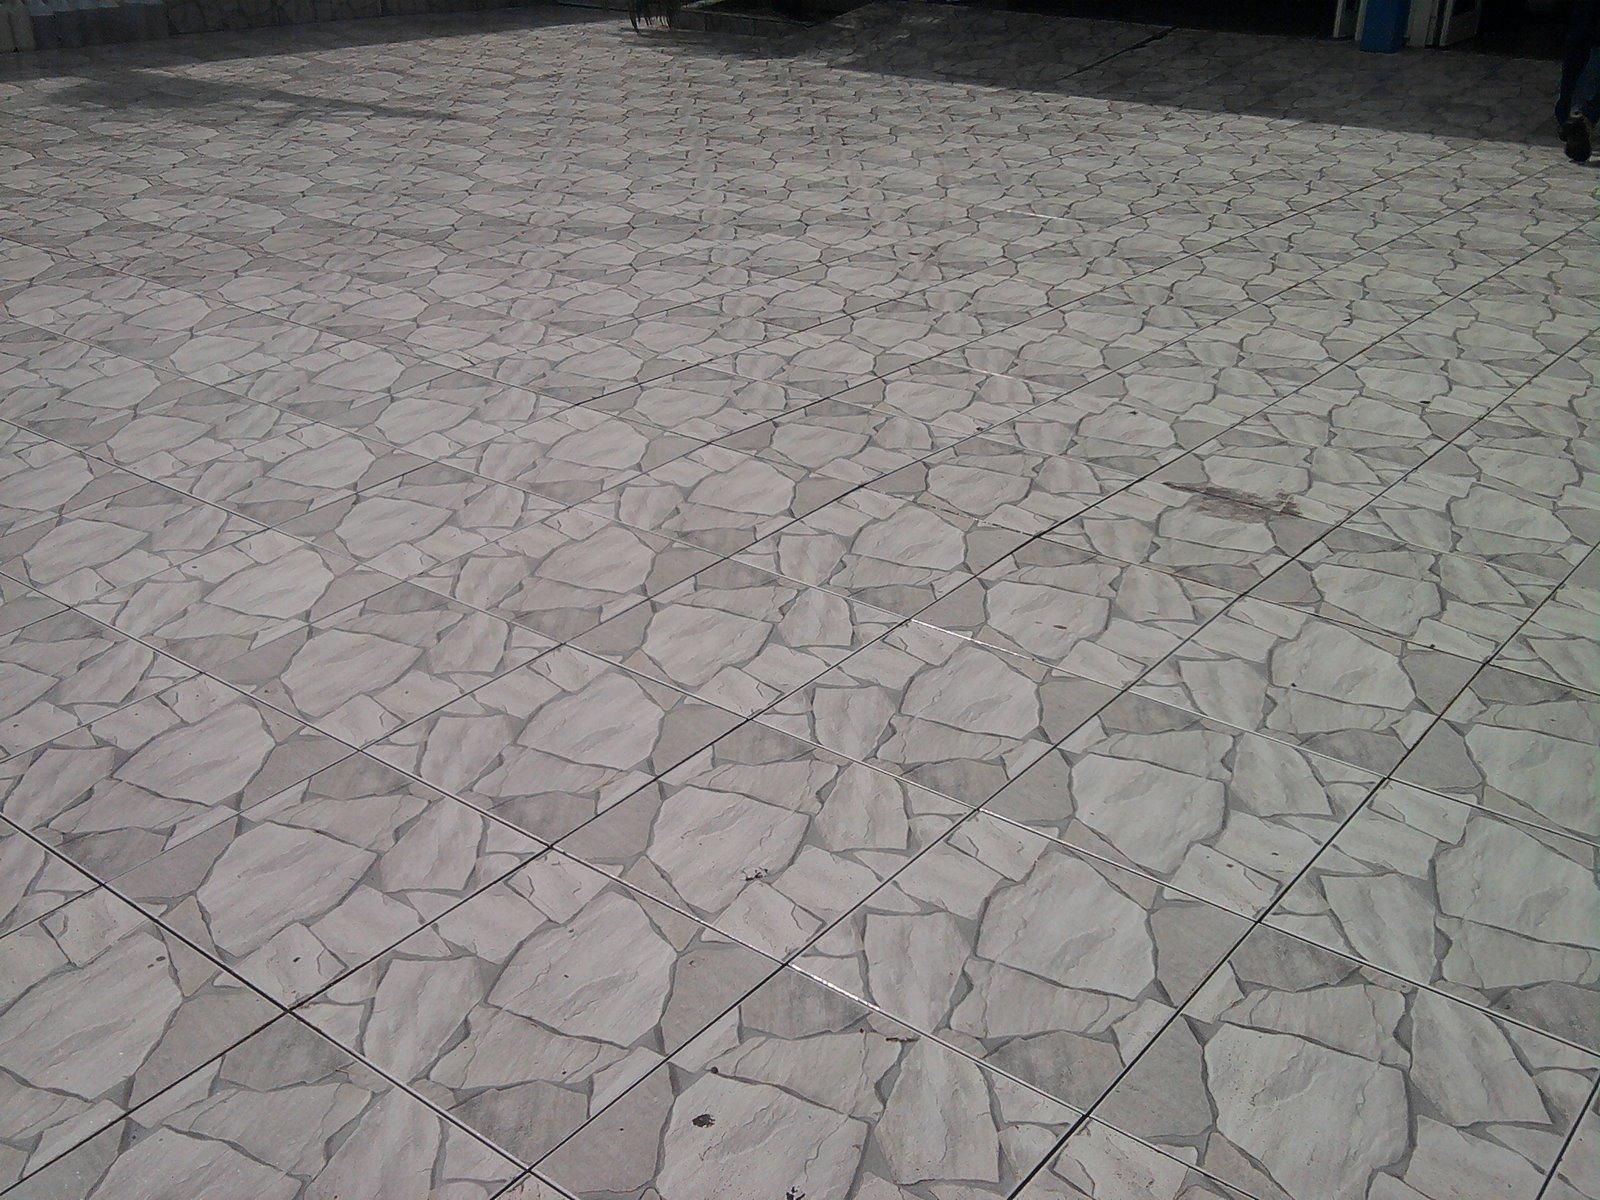 Piso antiderrapante de cer mica porcelanato e pedras for Modelos de pisos exteriores